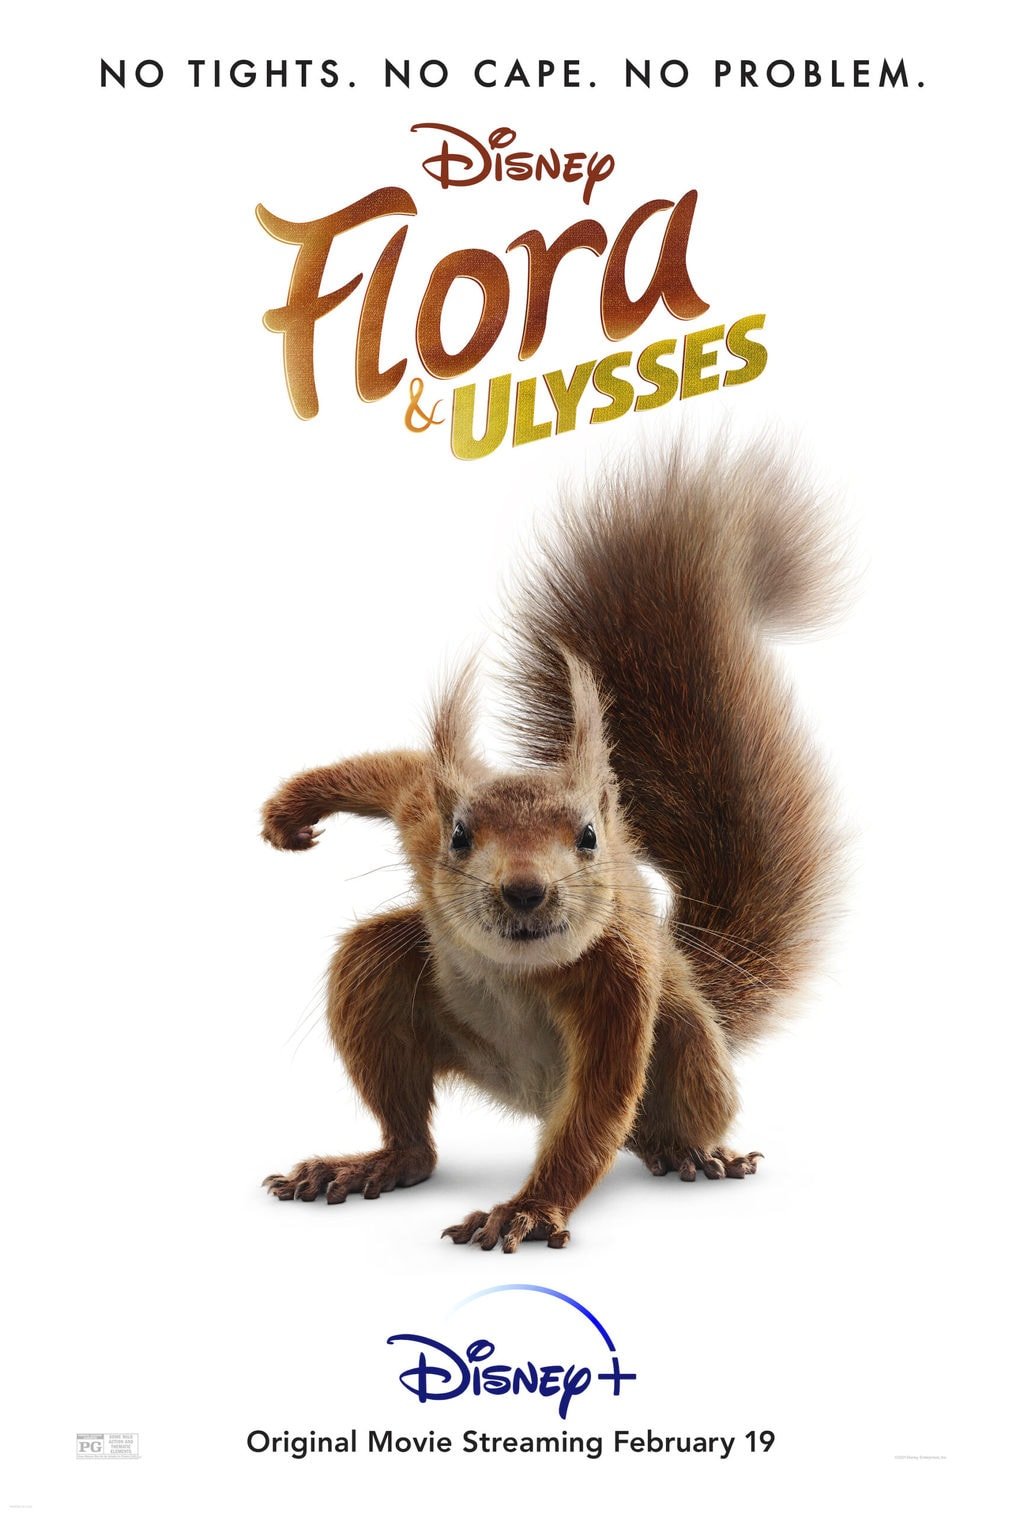 flor and ulysses poster